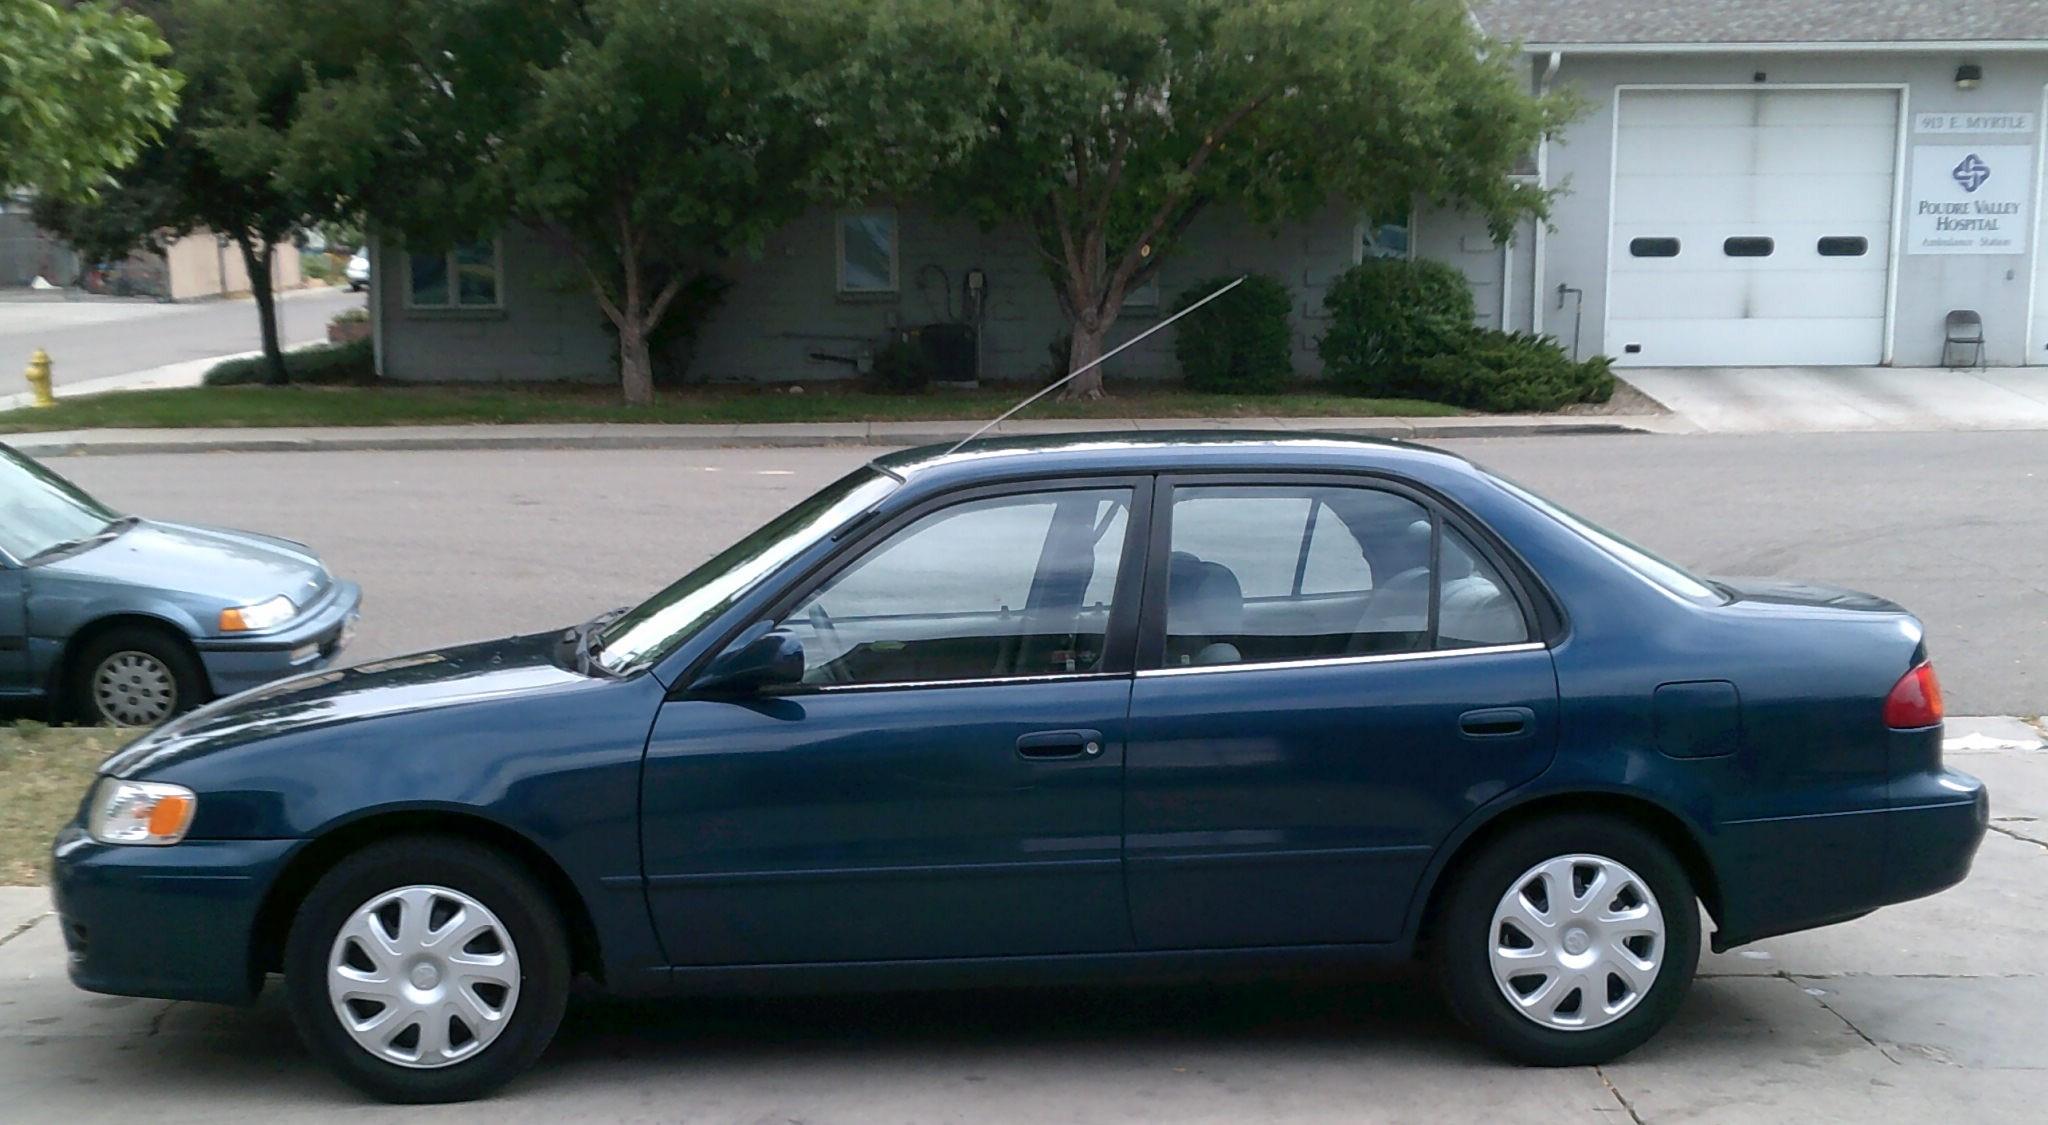 Exceptional 2001 Toyota Corolla #5 Toyota Corolla #5